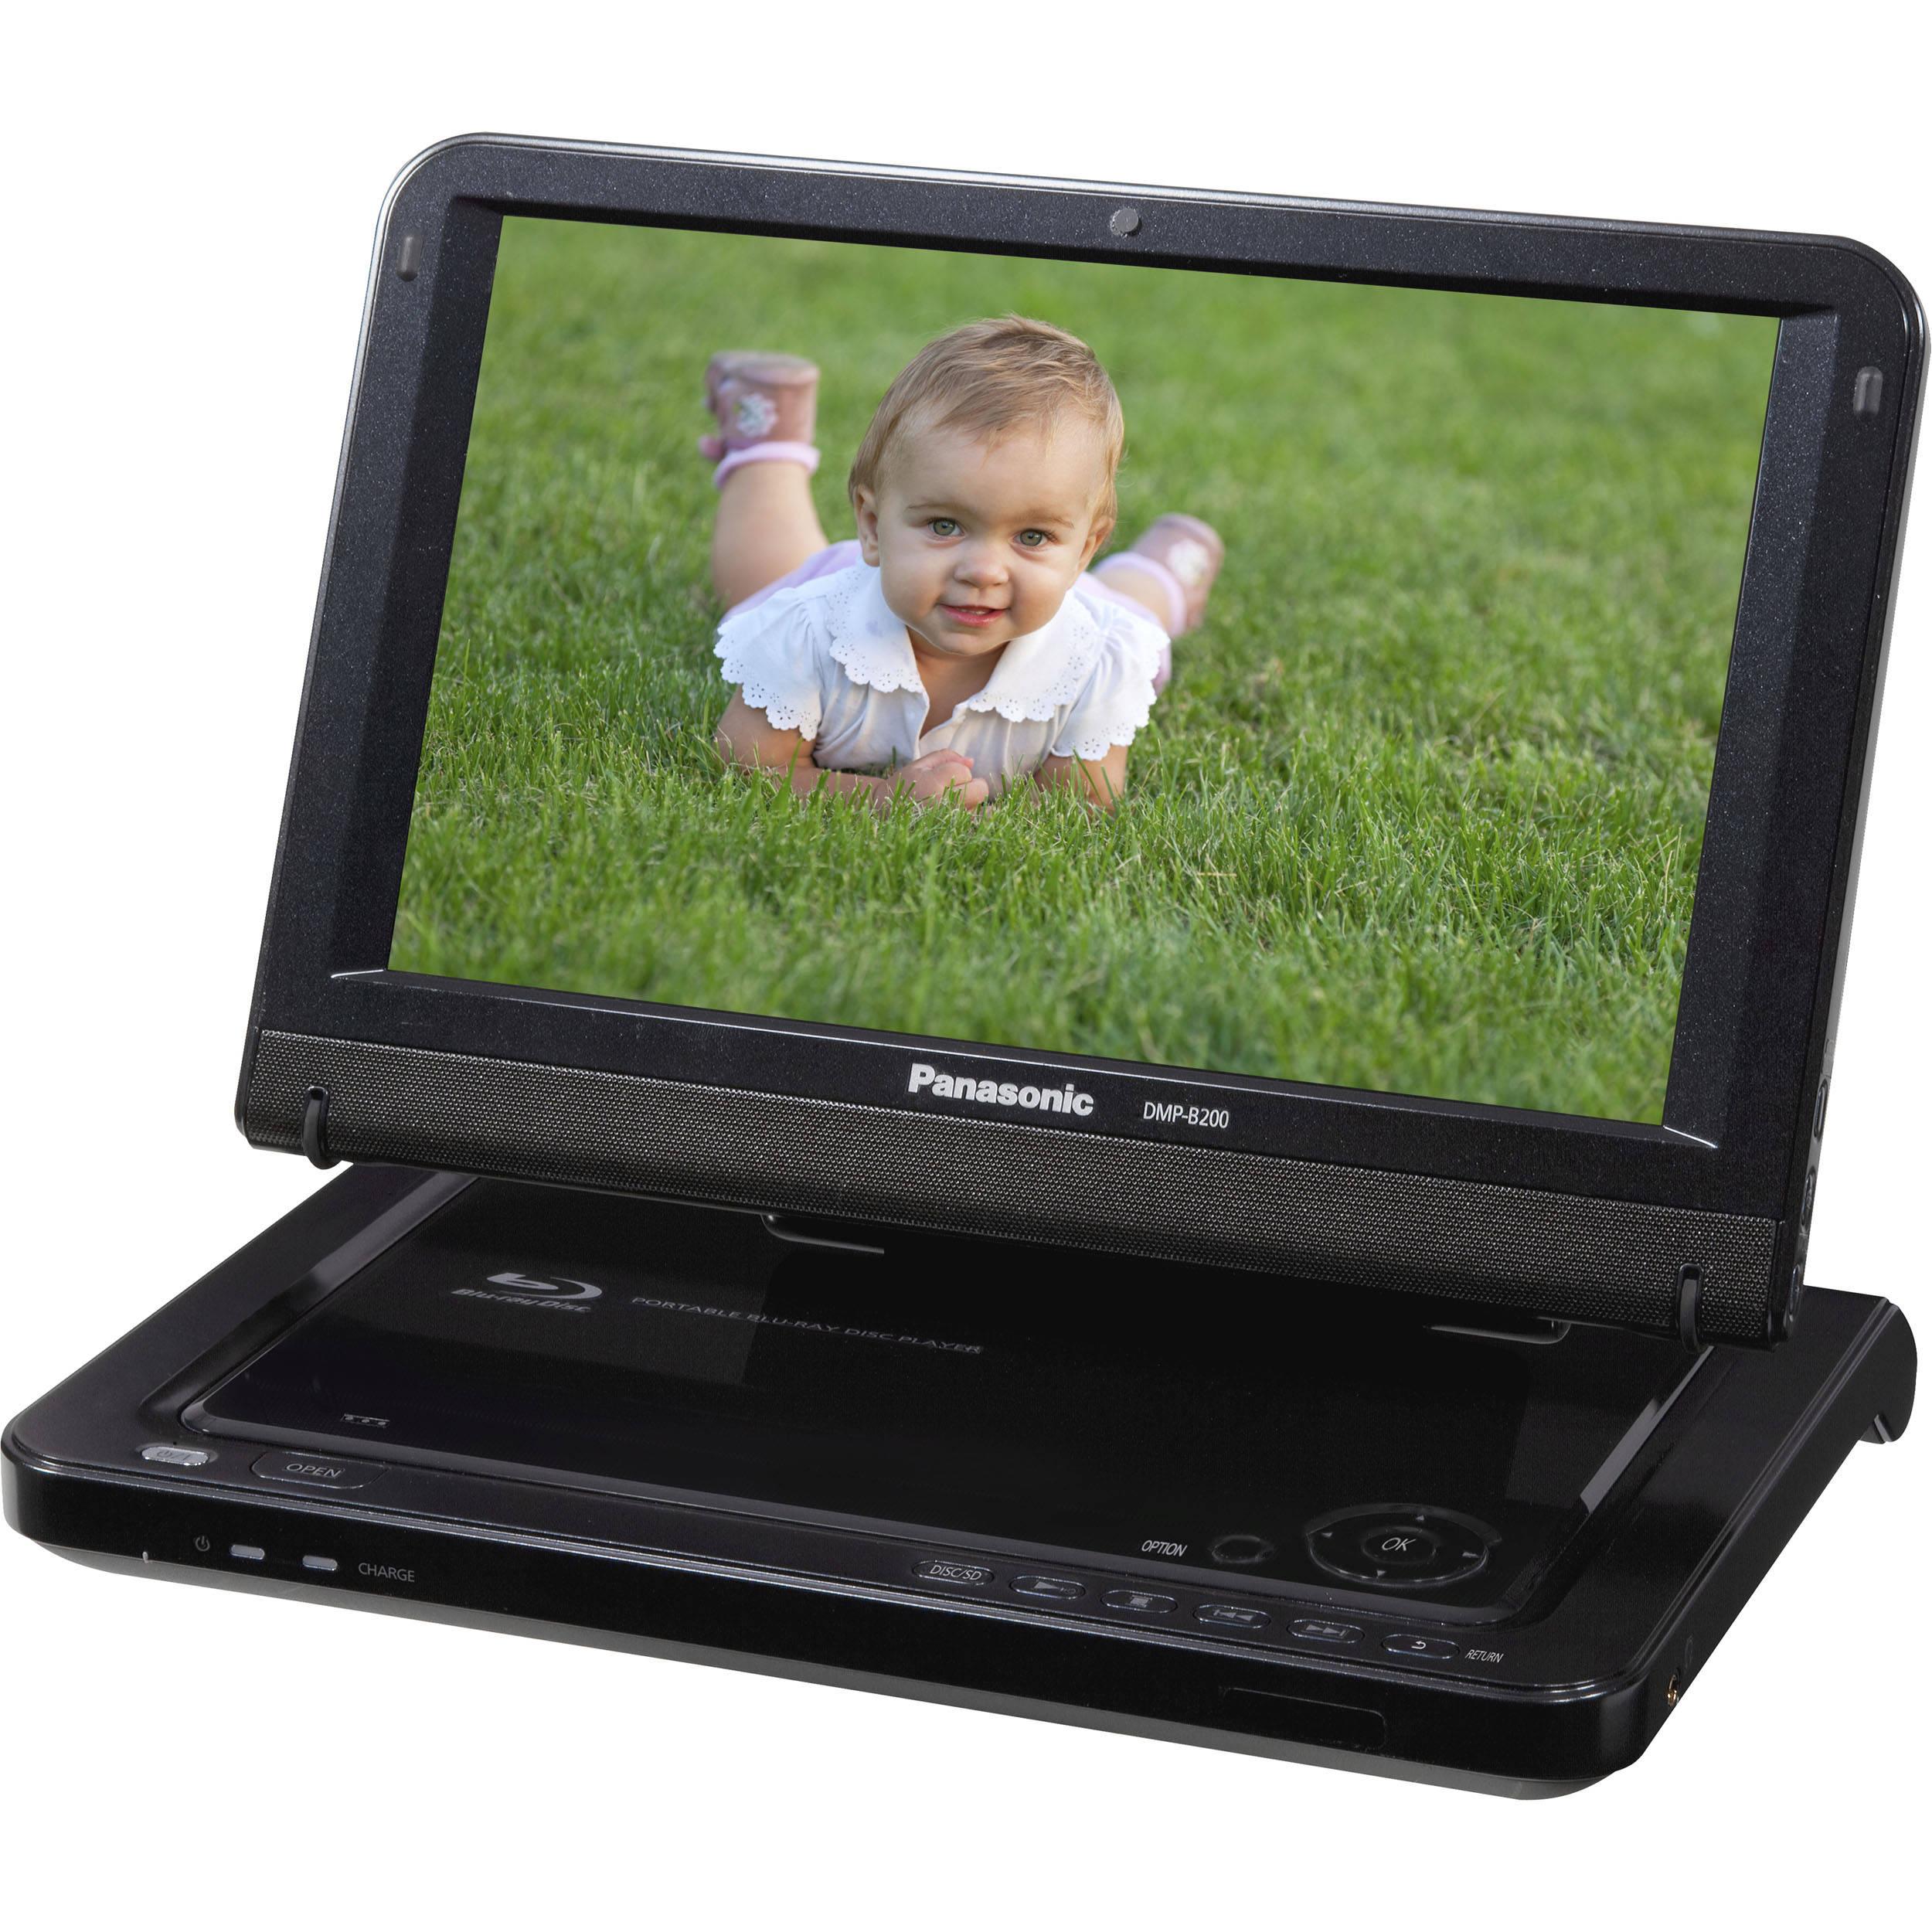 panasonic dmp b200 portable blu ray disc player dmp b200 b h. Black Bedroom Furniture Sets. Home Design Ideas